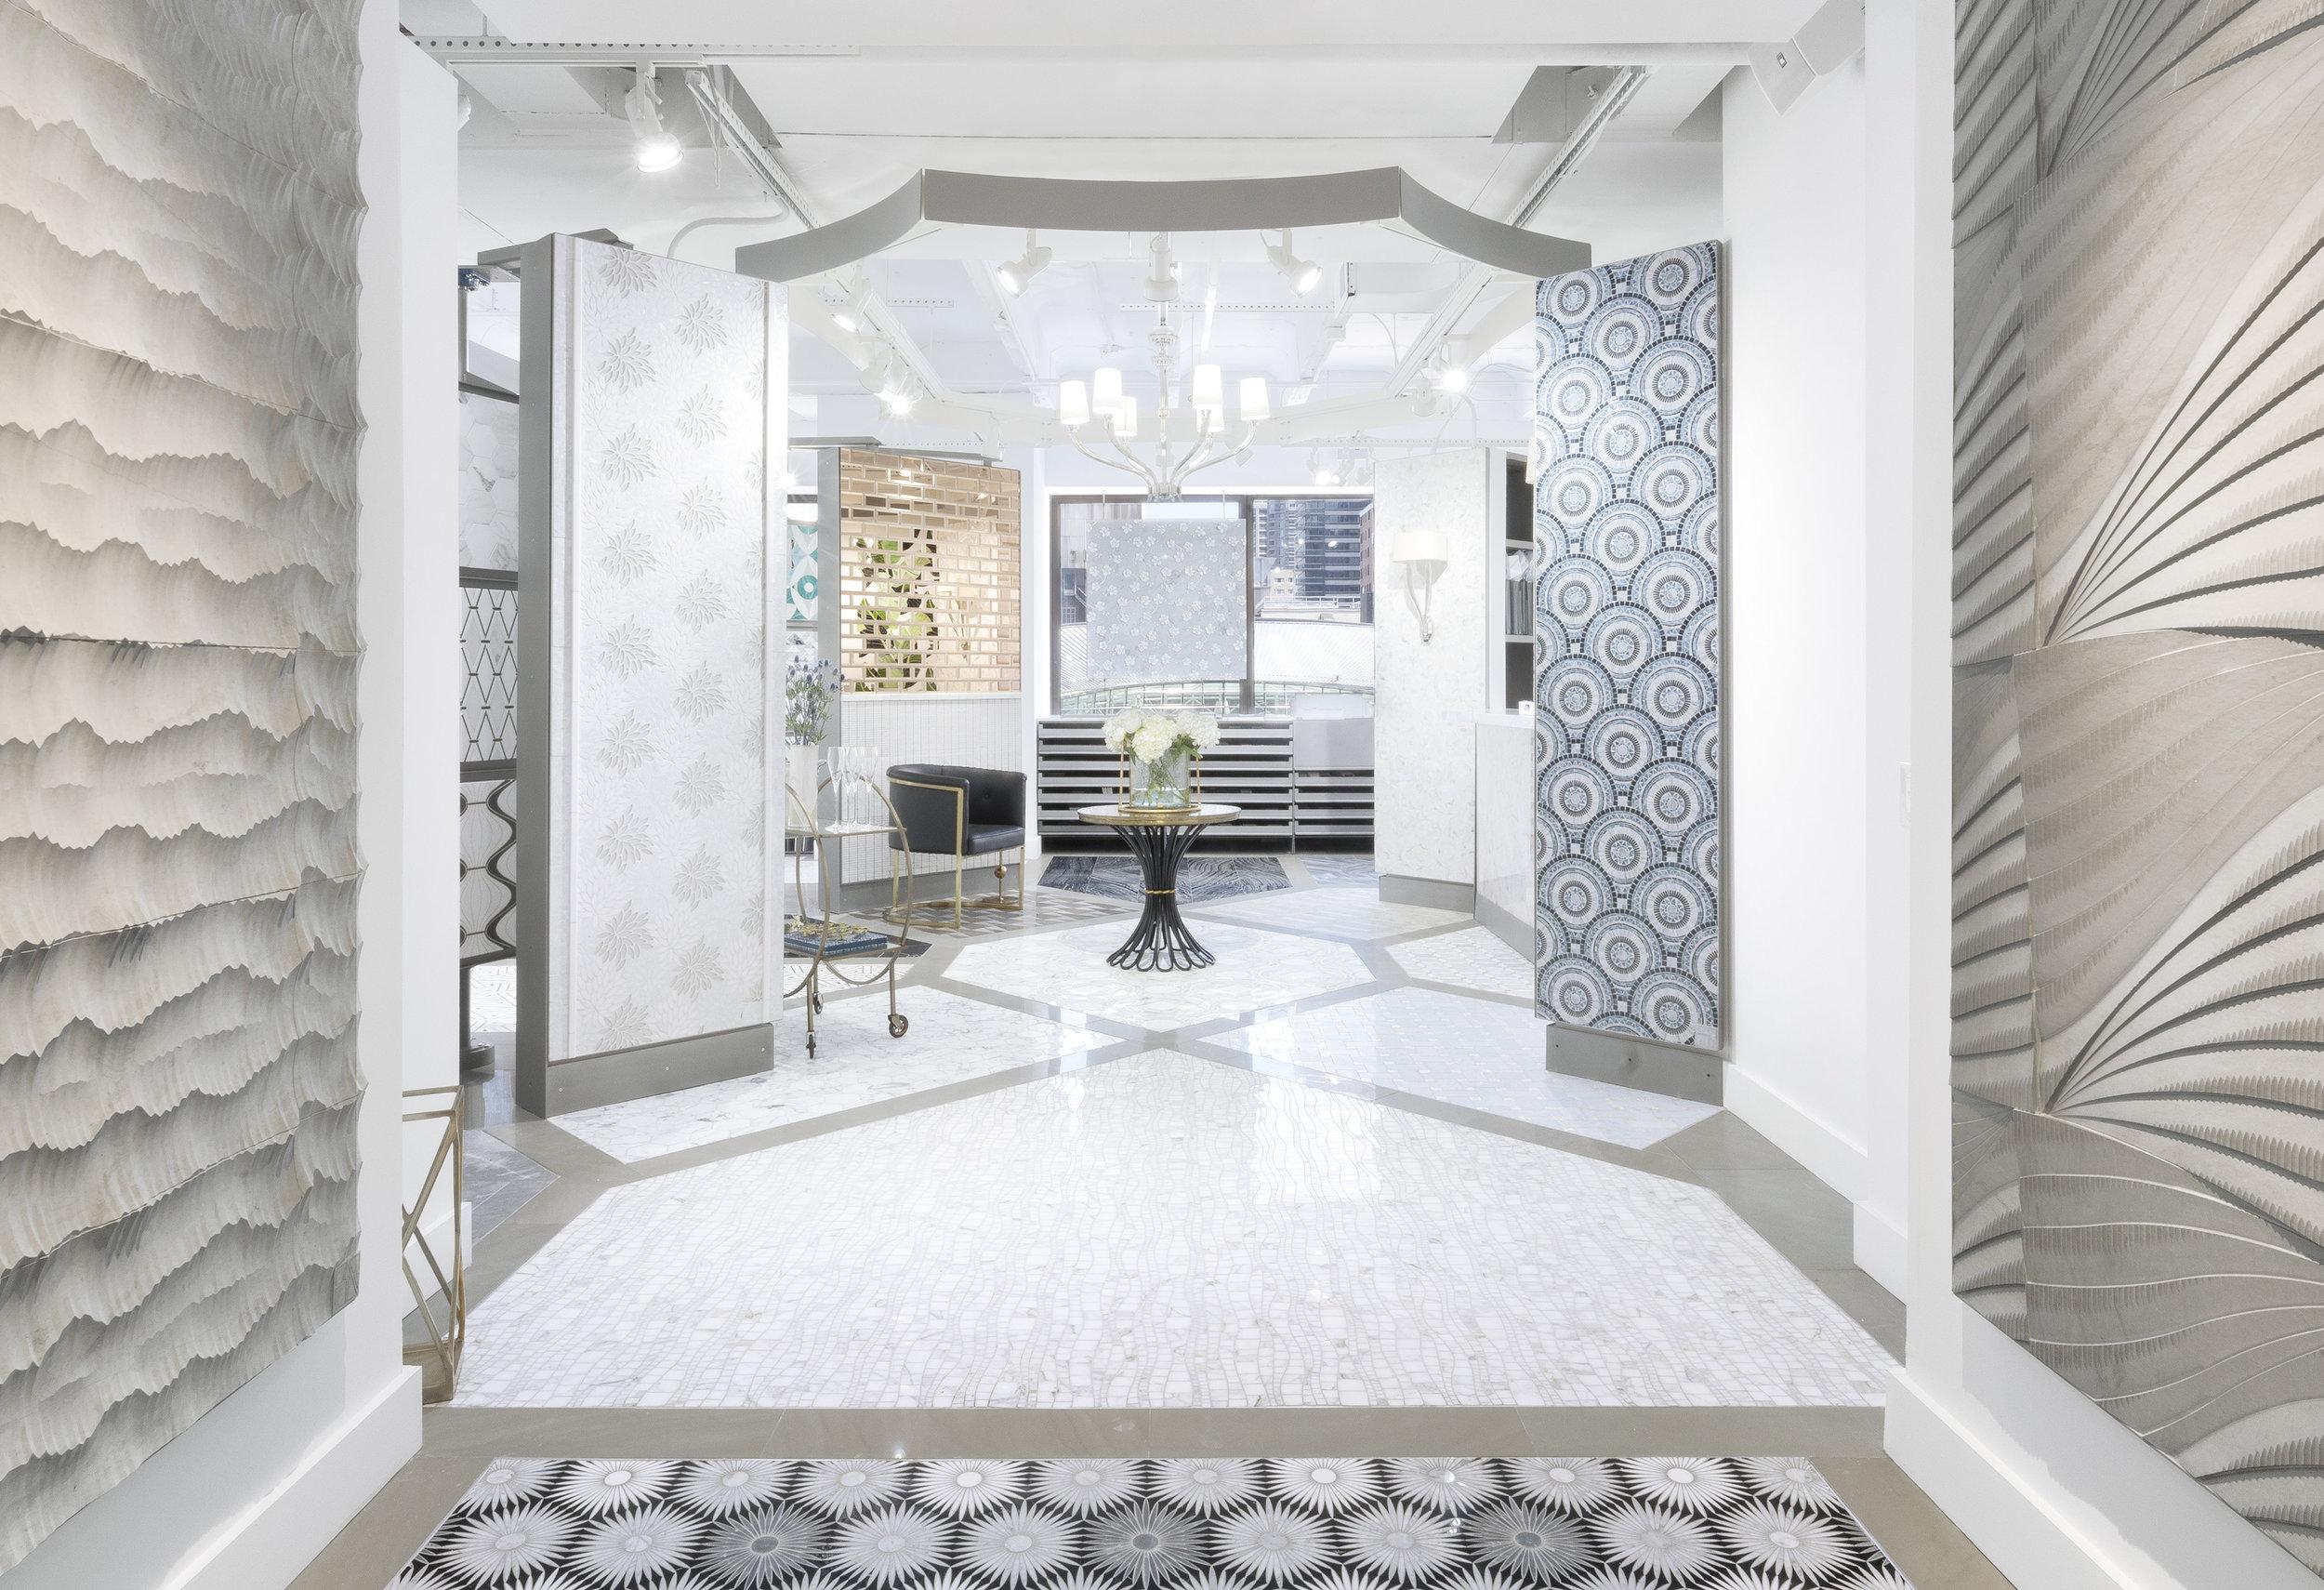 artistic tile ad dana liv interiors